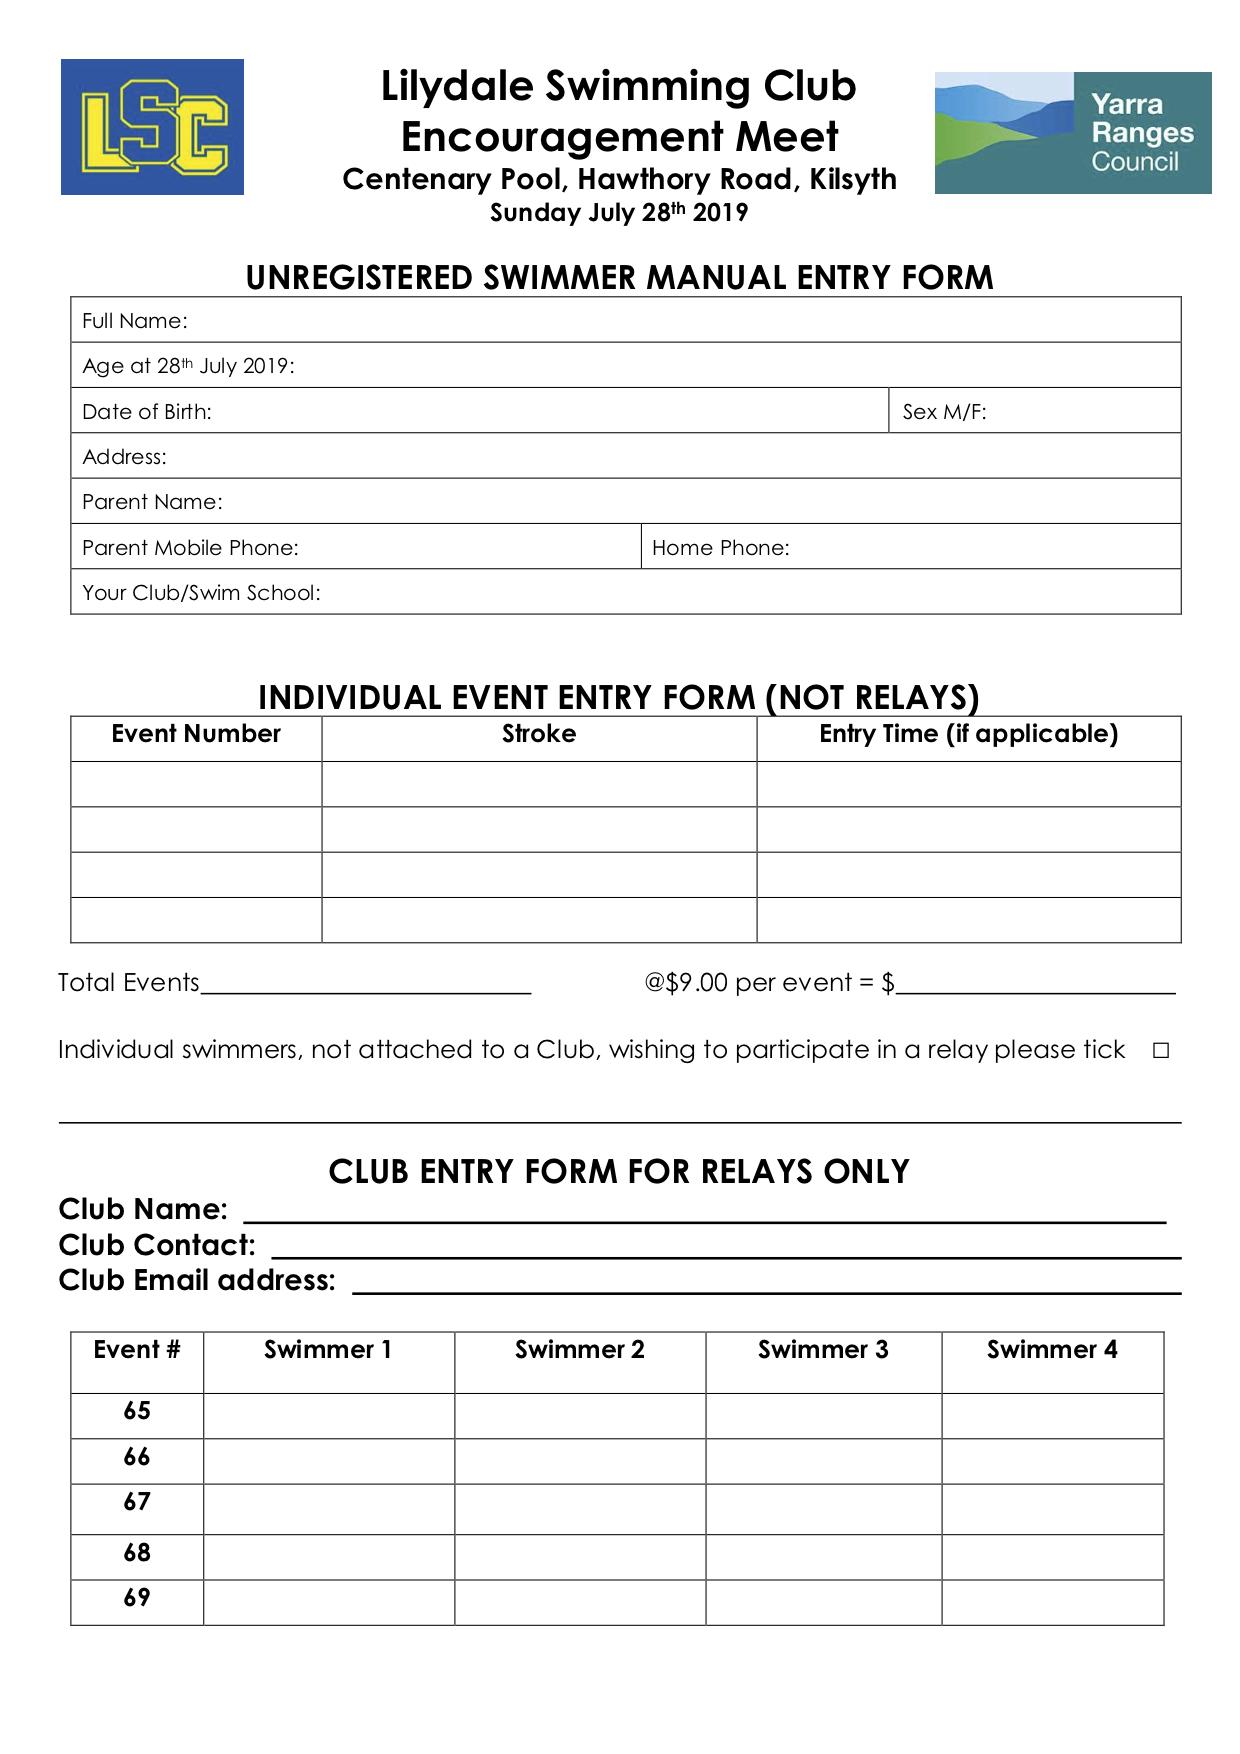 2019 LSC Encouragement Meet Manual Entry Form pg1.jpg